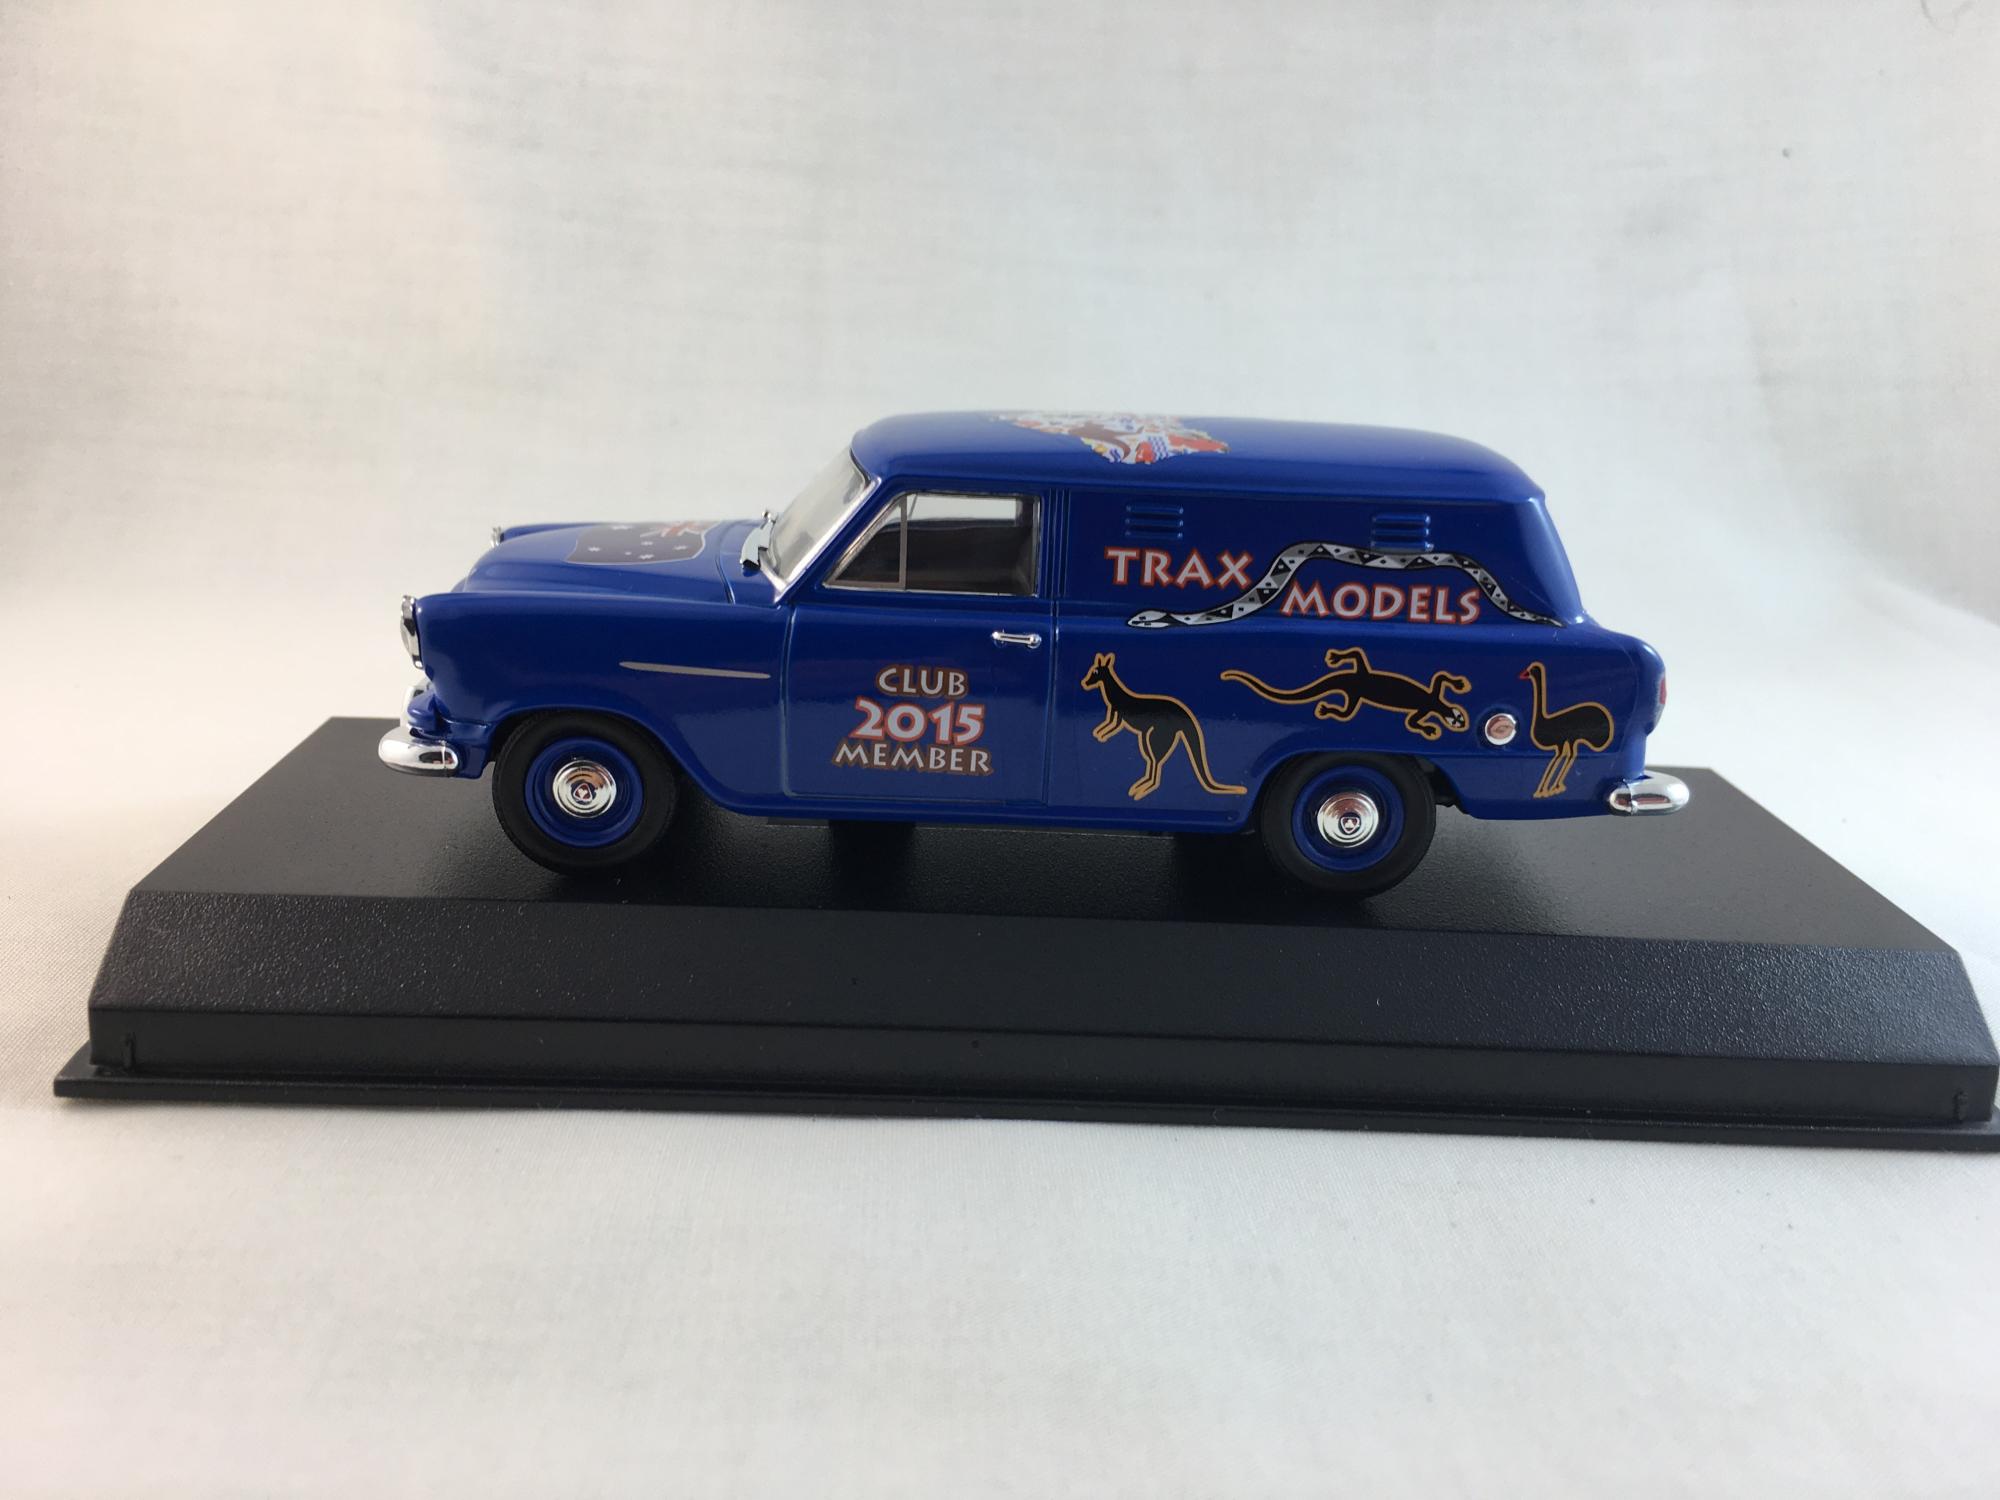 Trax Club Members Car 2015